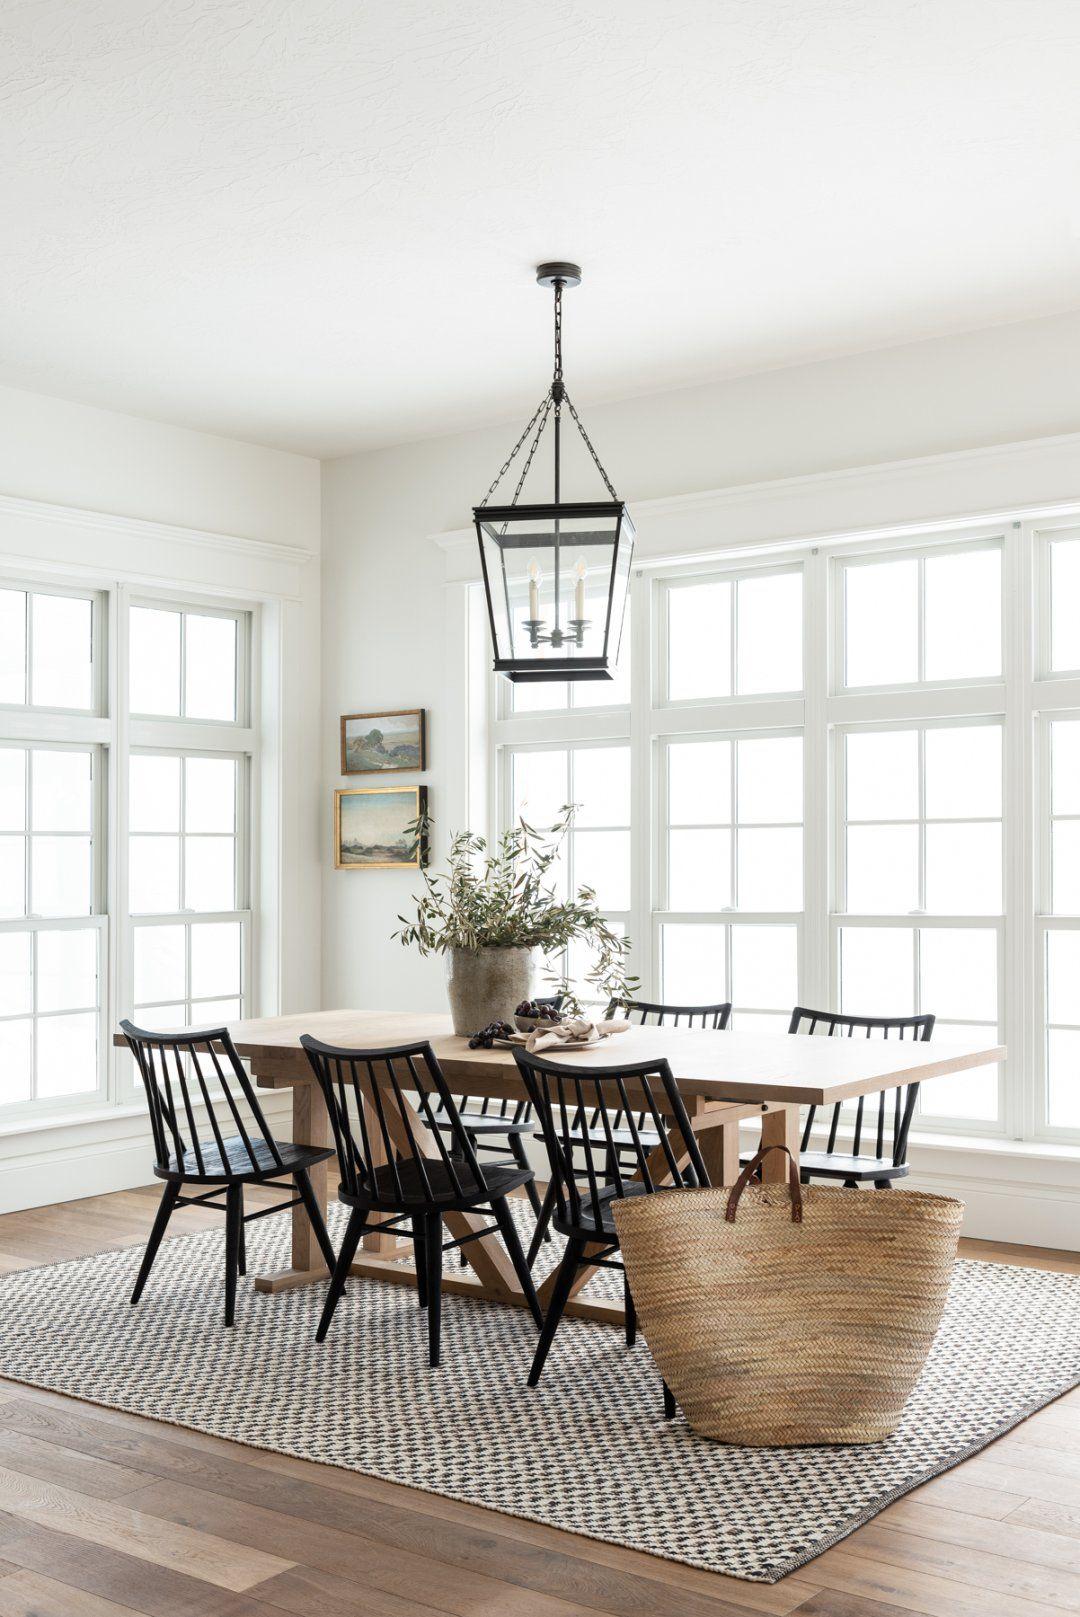 Timeless Dining Room & Kitchen Design - Studio McGee